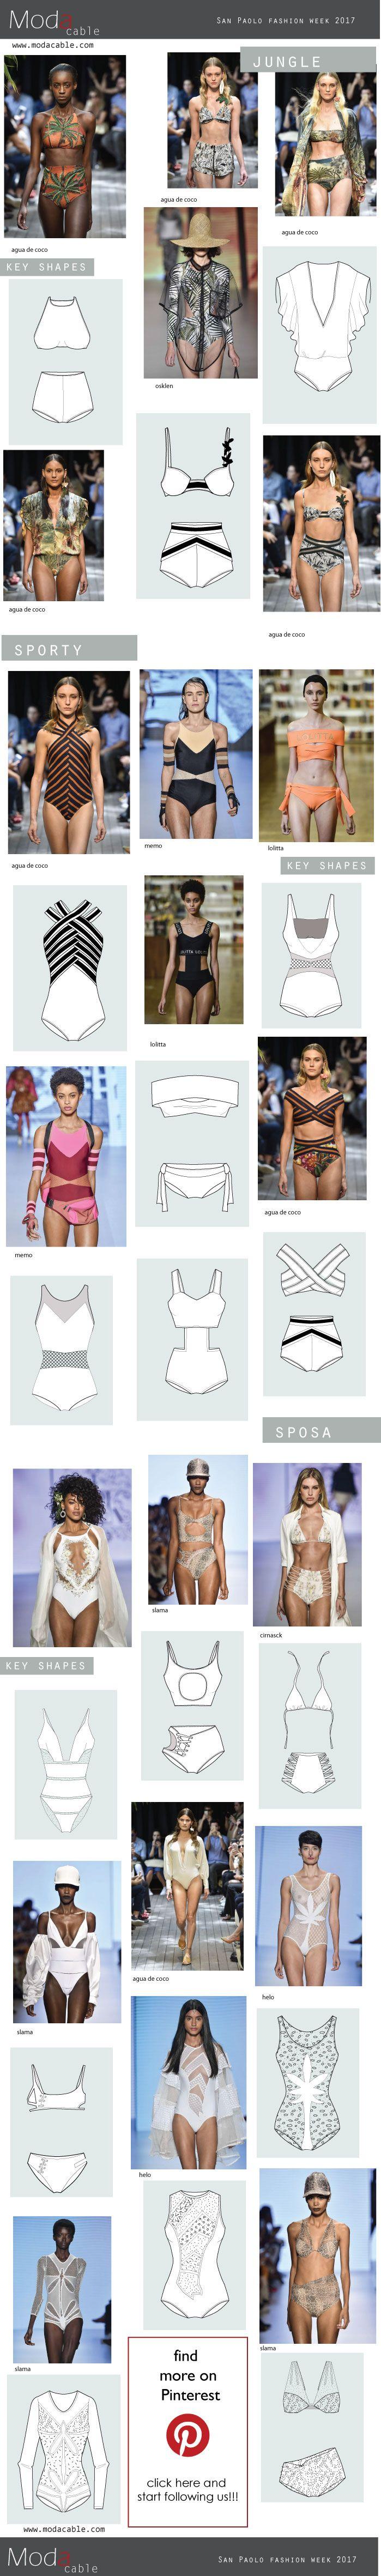 San Paulo SS 2017 swimwear key shapes